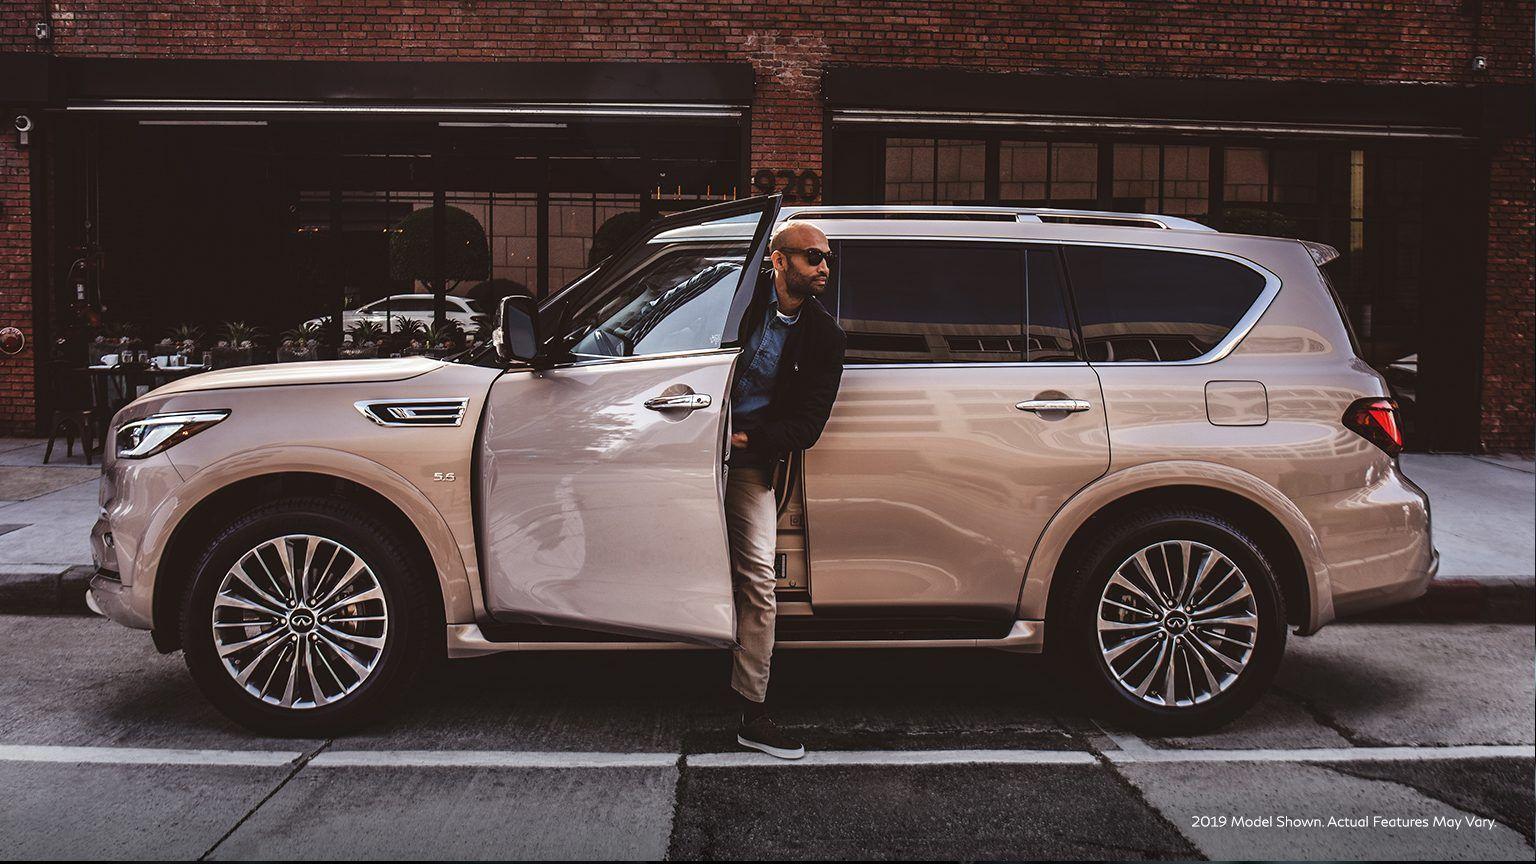 2020 Infiniti Qx80 Luxury Suv Features Infiniti Usa In 2020 Luxury Suv Suv Infiniti Usa